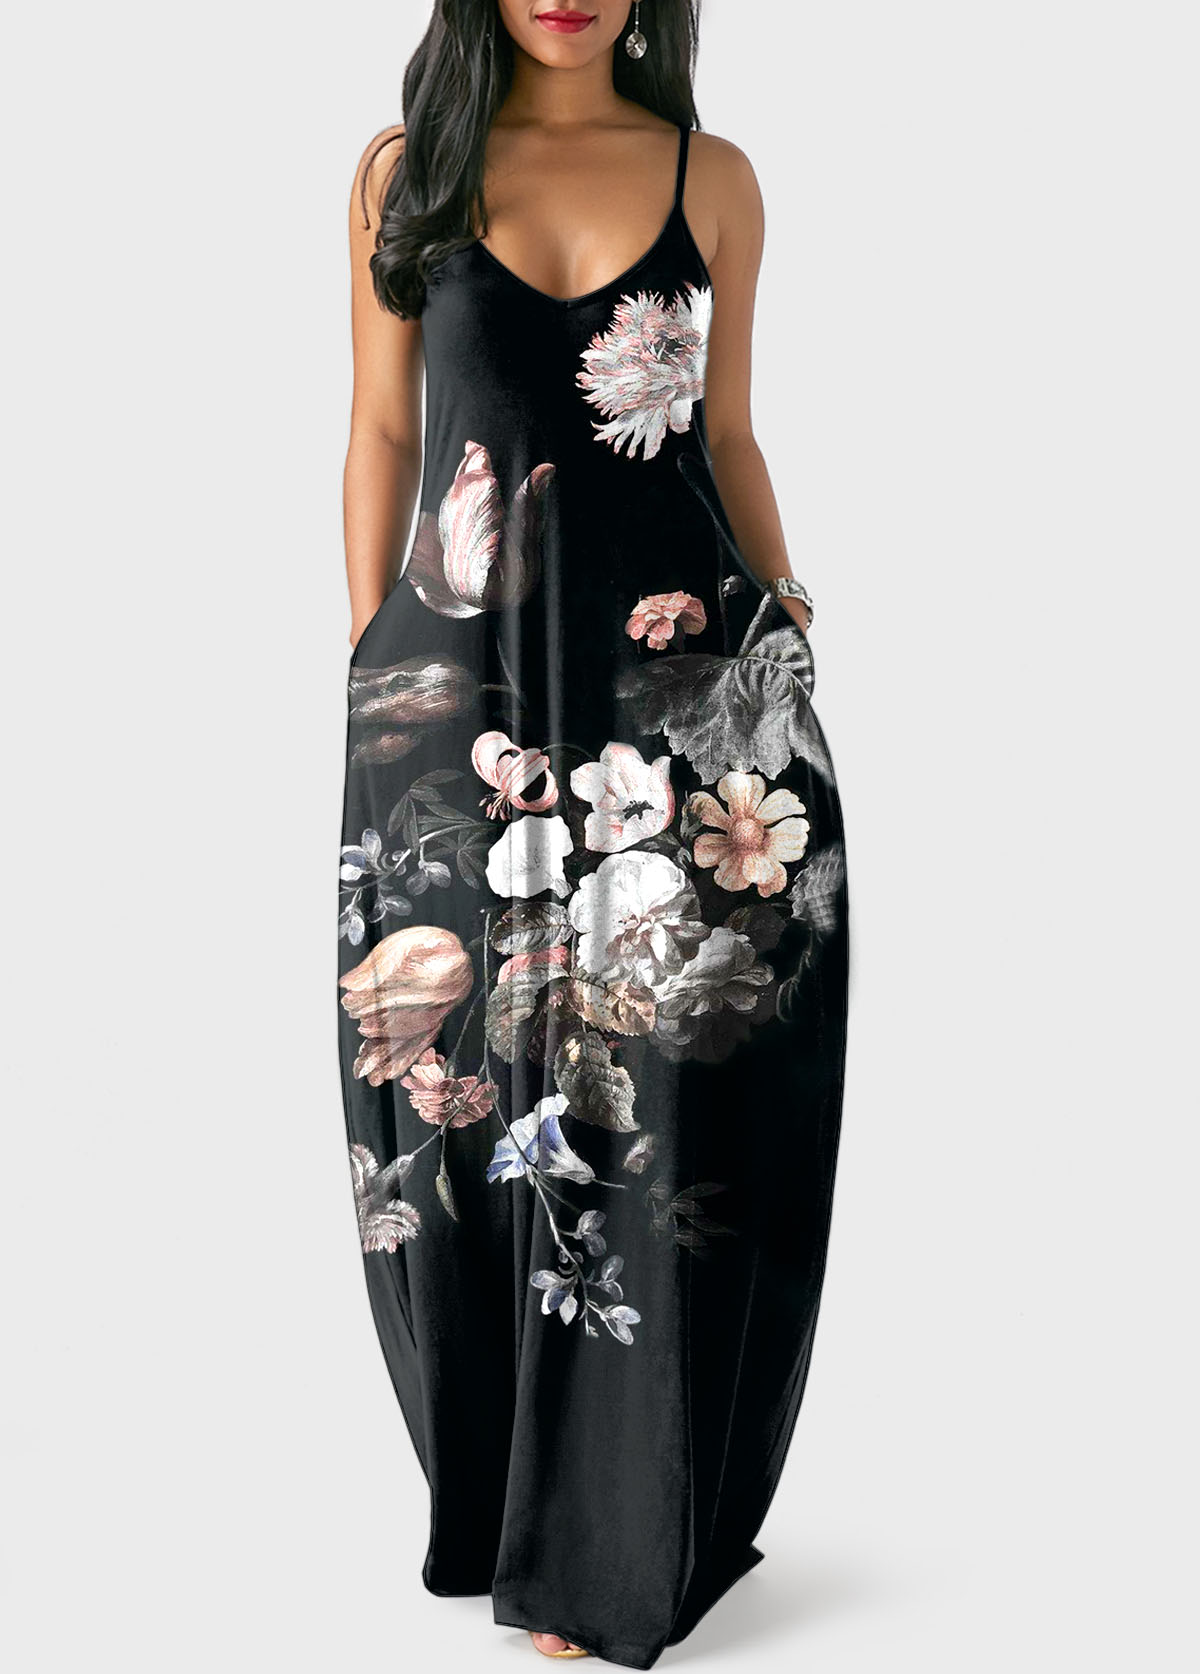 Large Floral Print Spaghetti Strap Black Dress